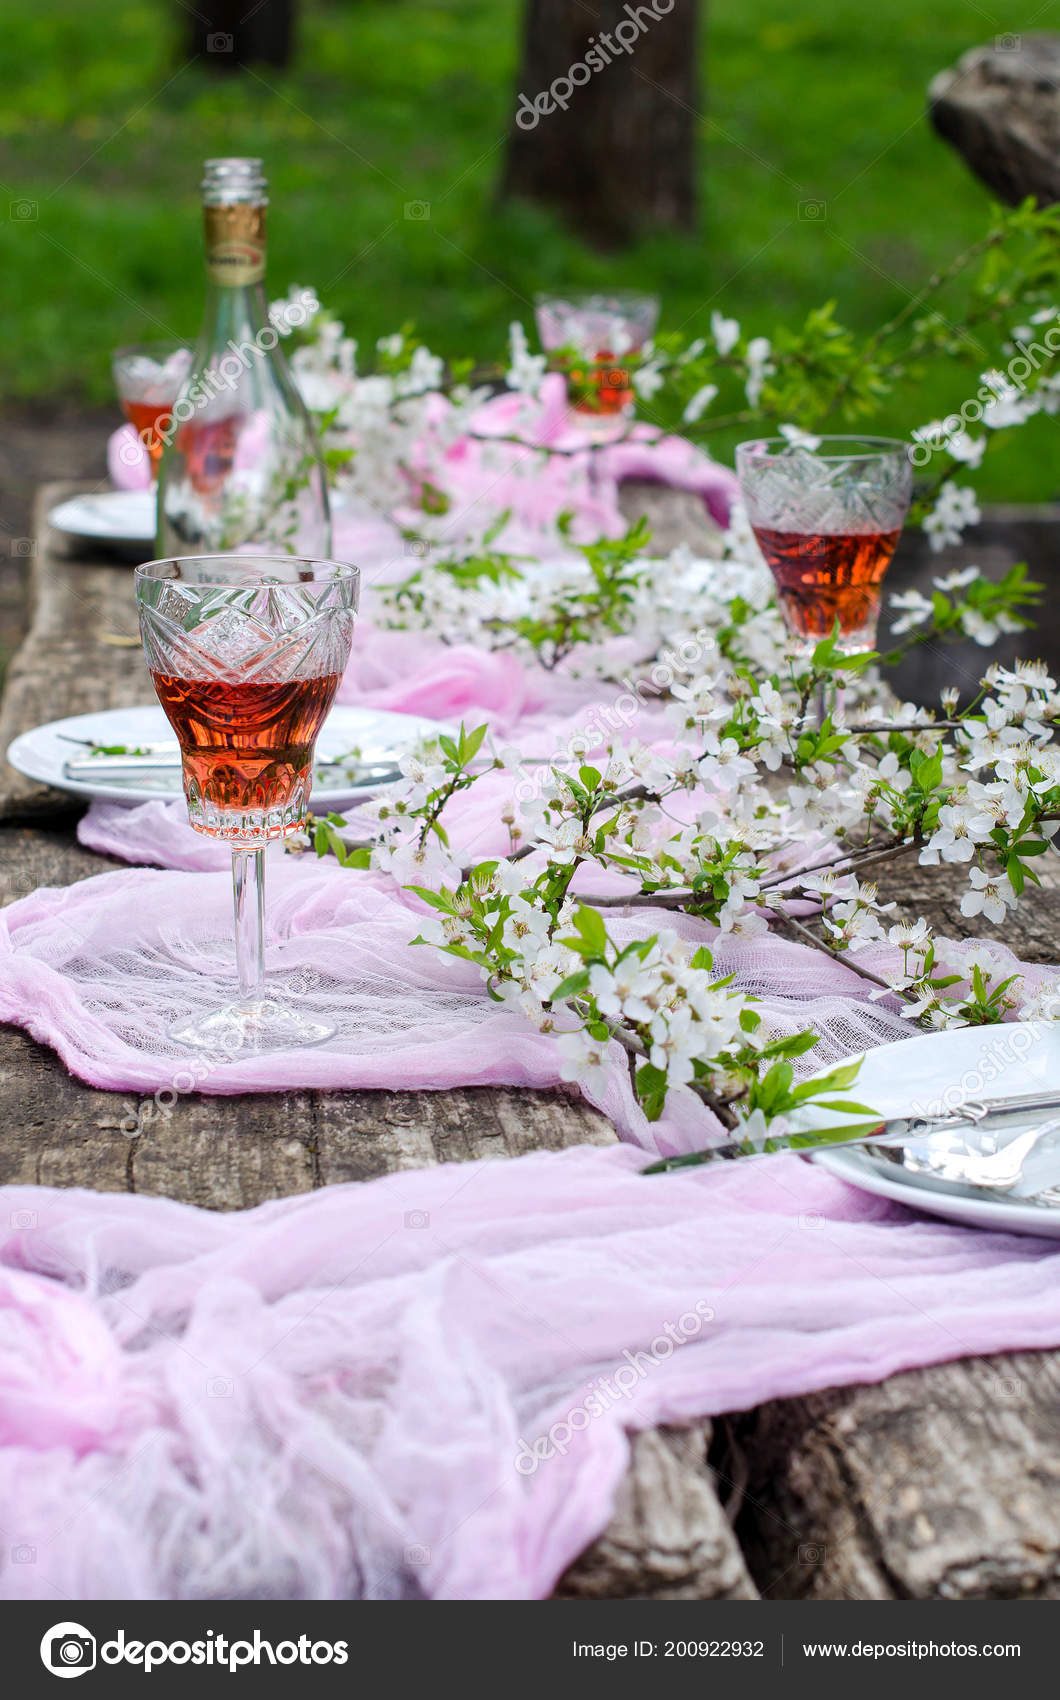 Belle Table Fond Fête Dans Jardin Ancienne Table Bois